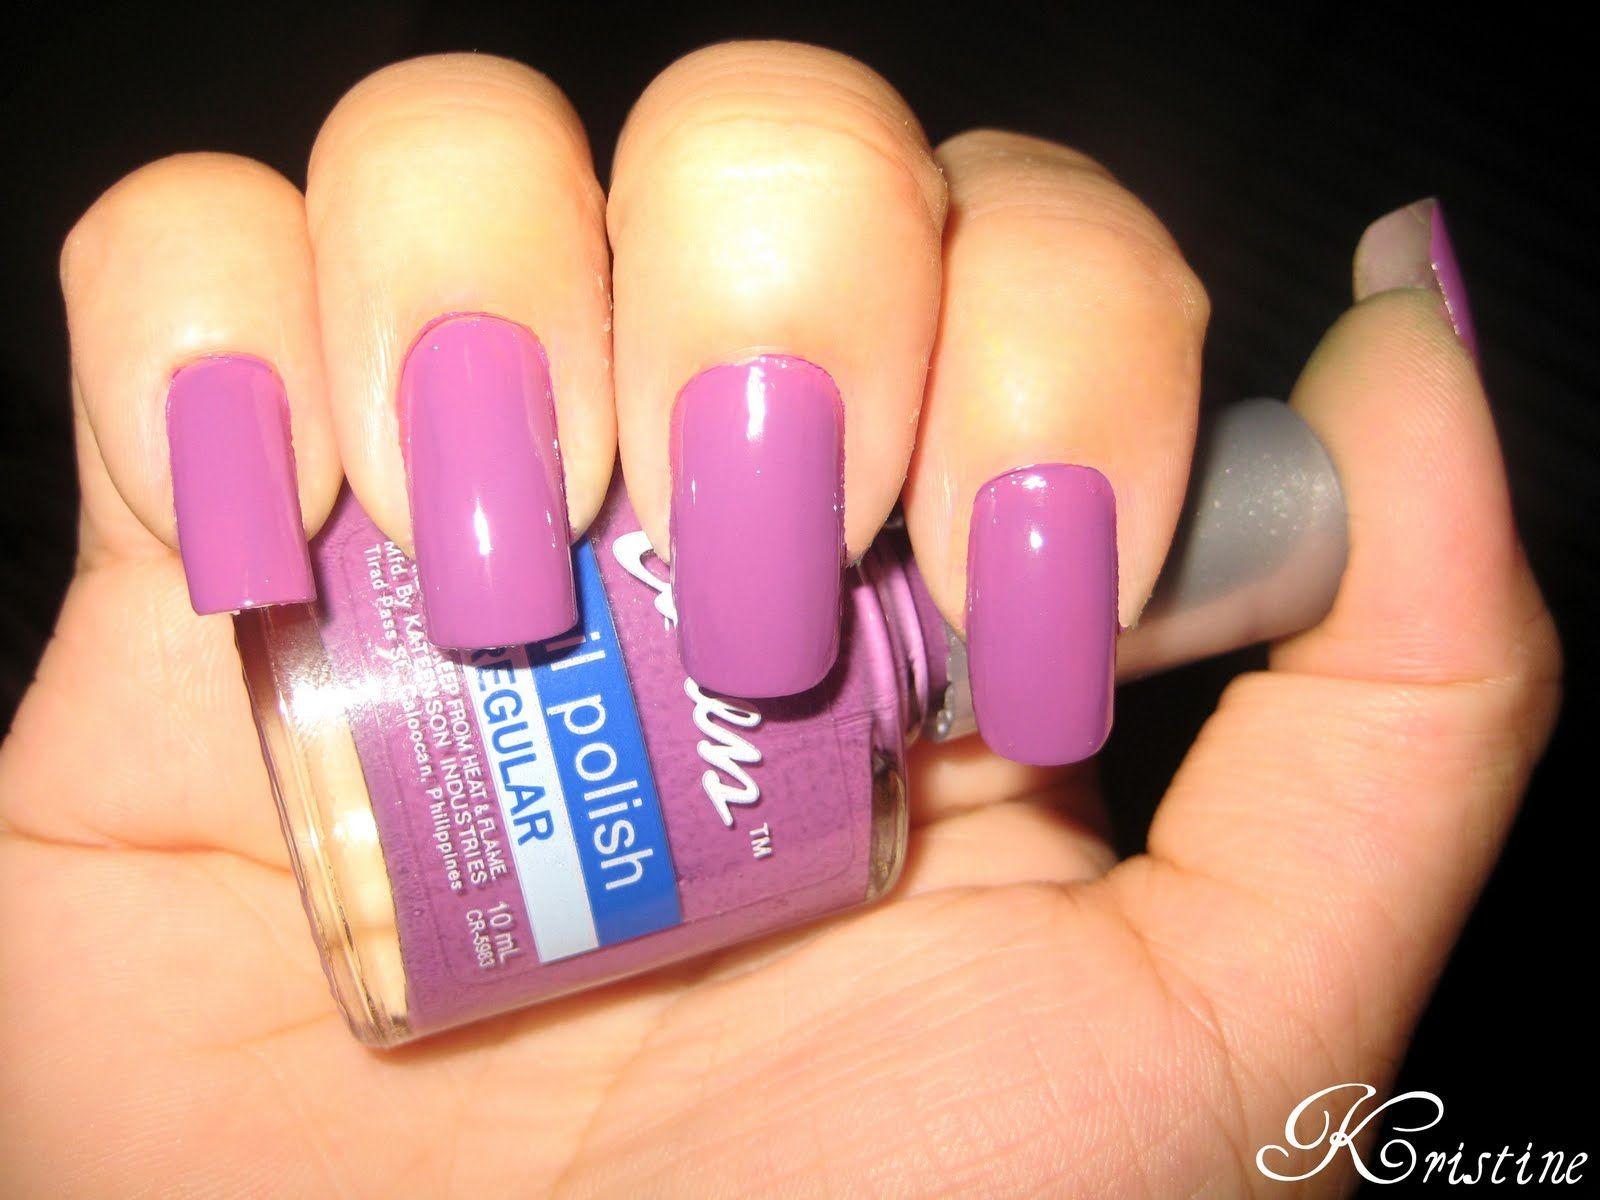 Nail Polish Colors For Dark Skin Tones   Nail art designs ...